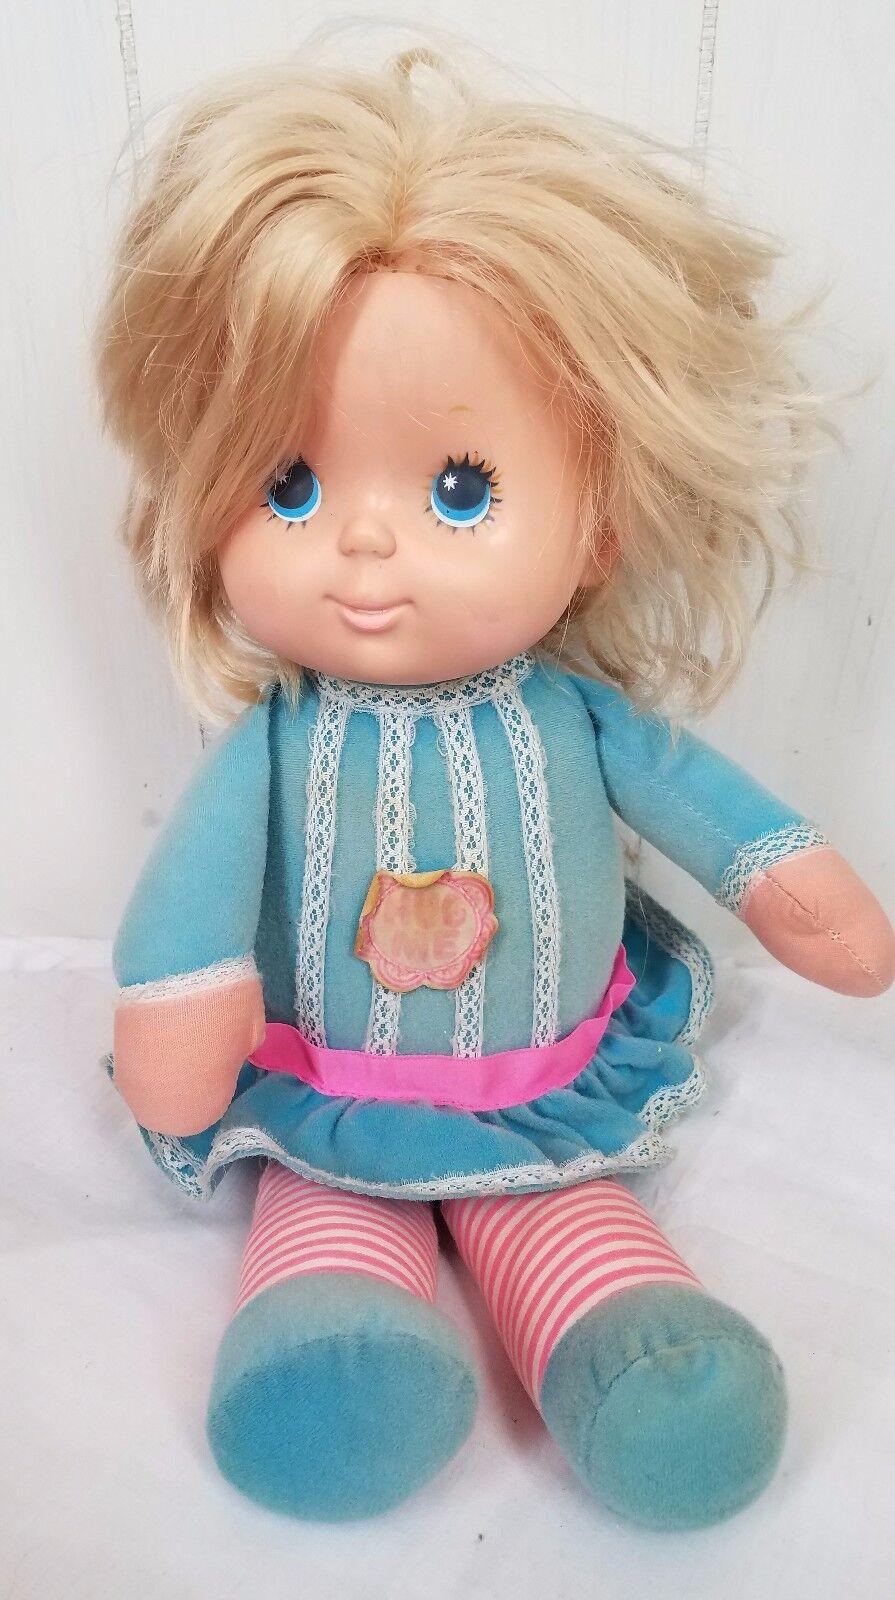 Vtg 1977 Mattel Talks Hug me baby doll Blonde with stuffed body RARE Works